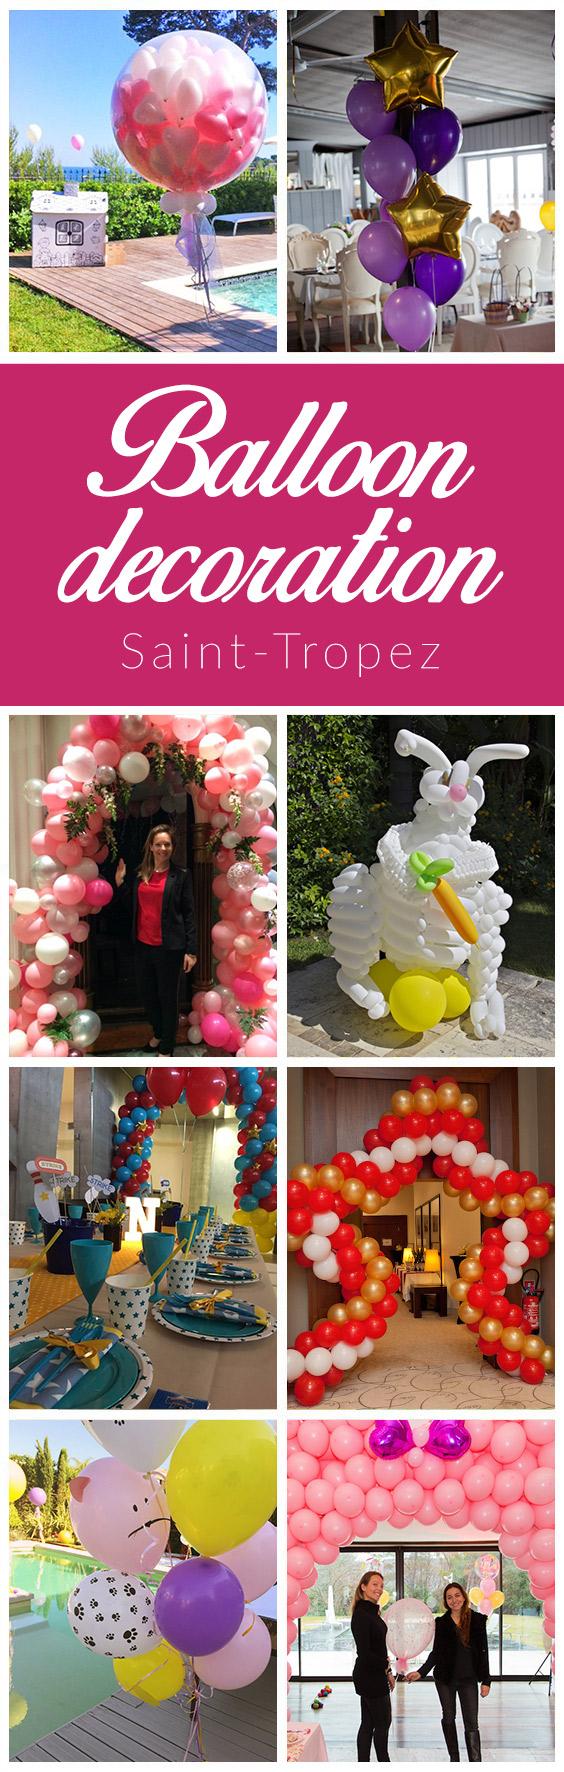 balloon decoration saint tropez